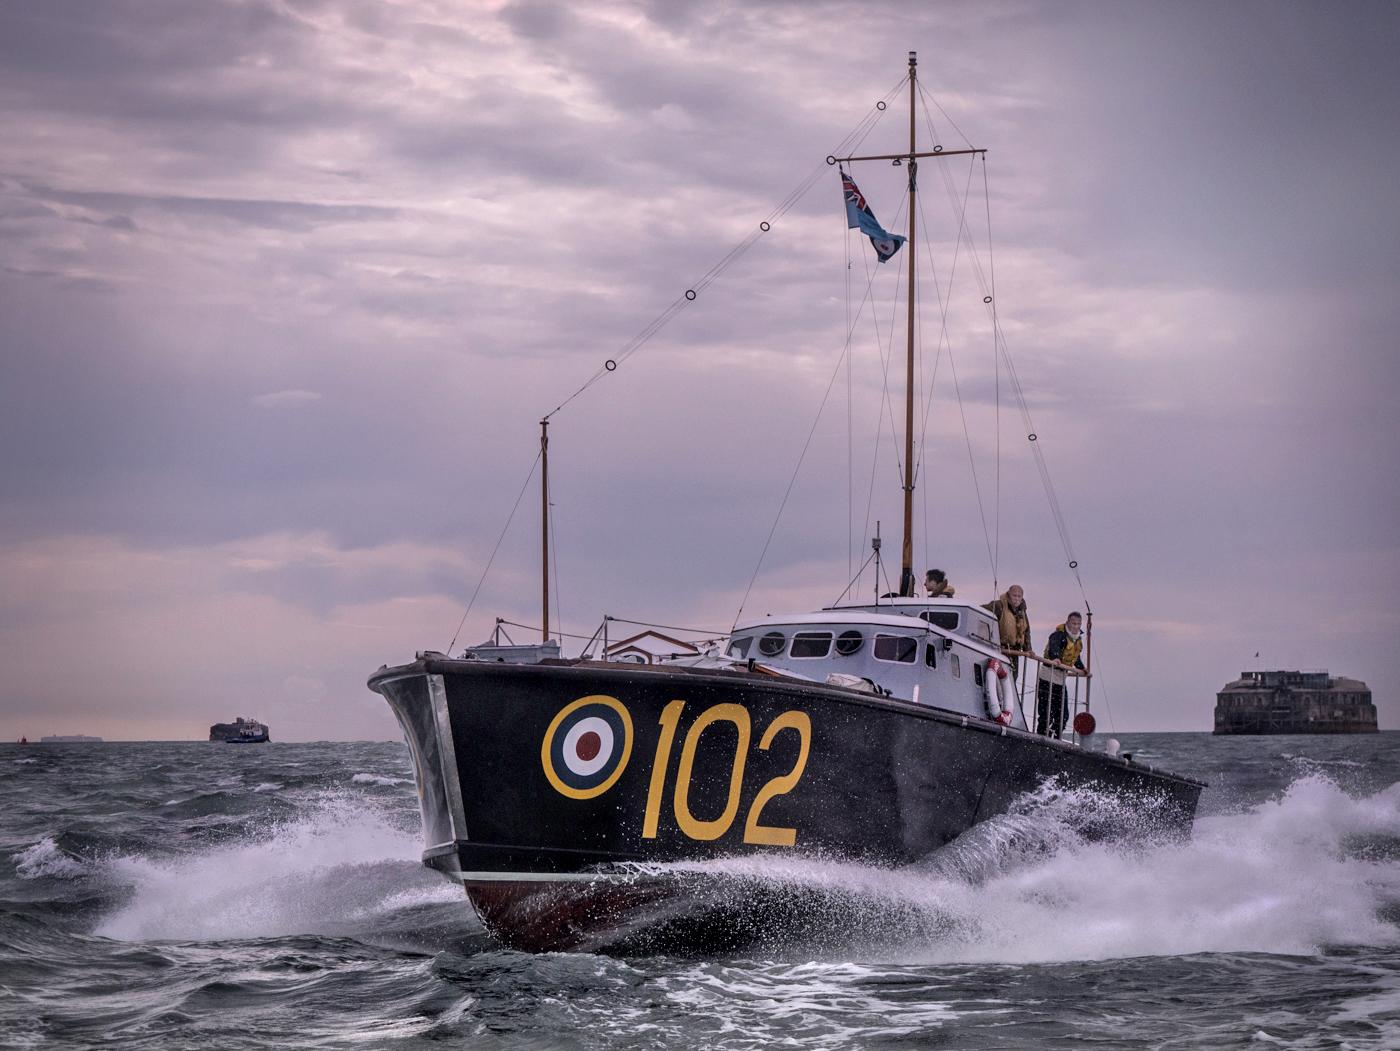 'Air Sea Rescue' by Ian Porter